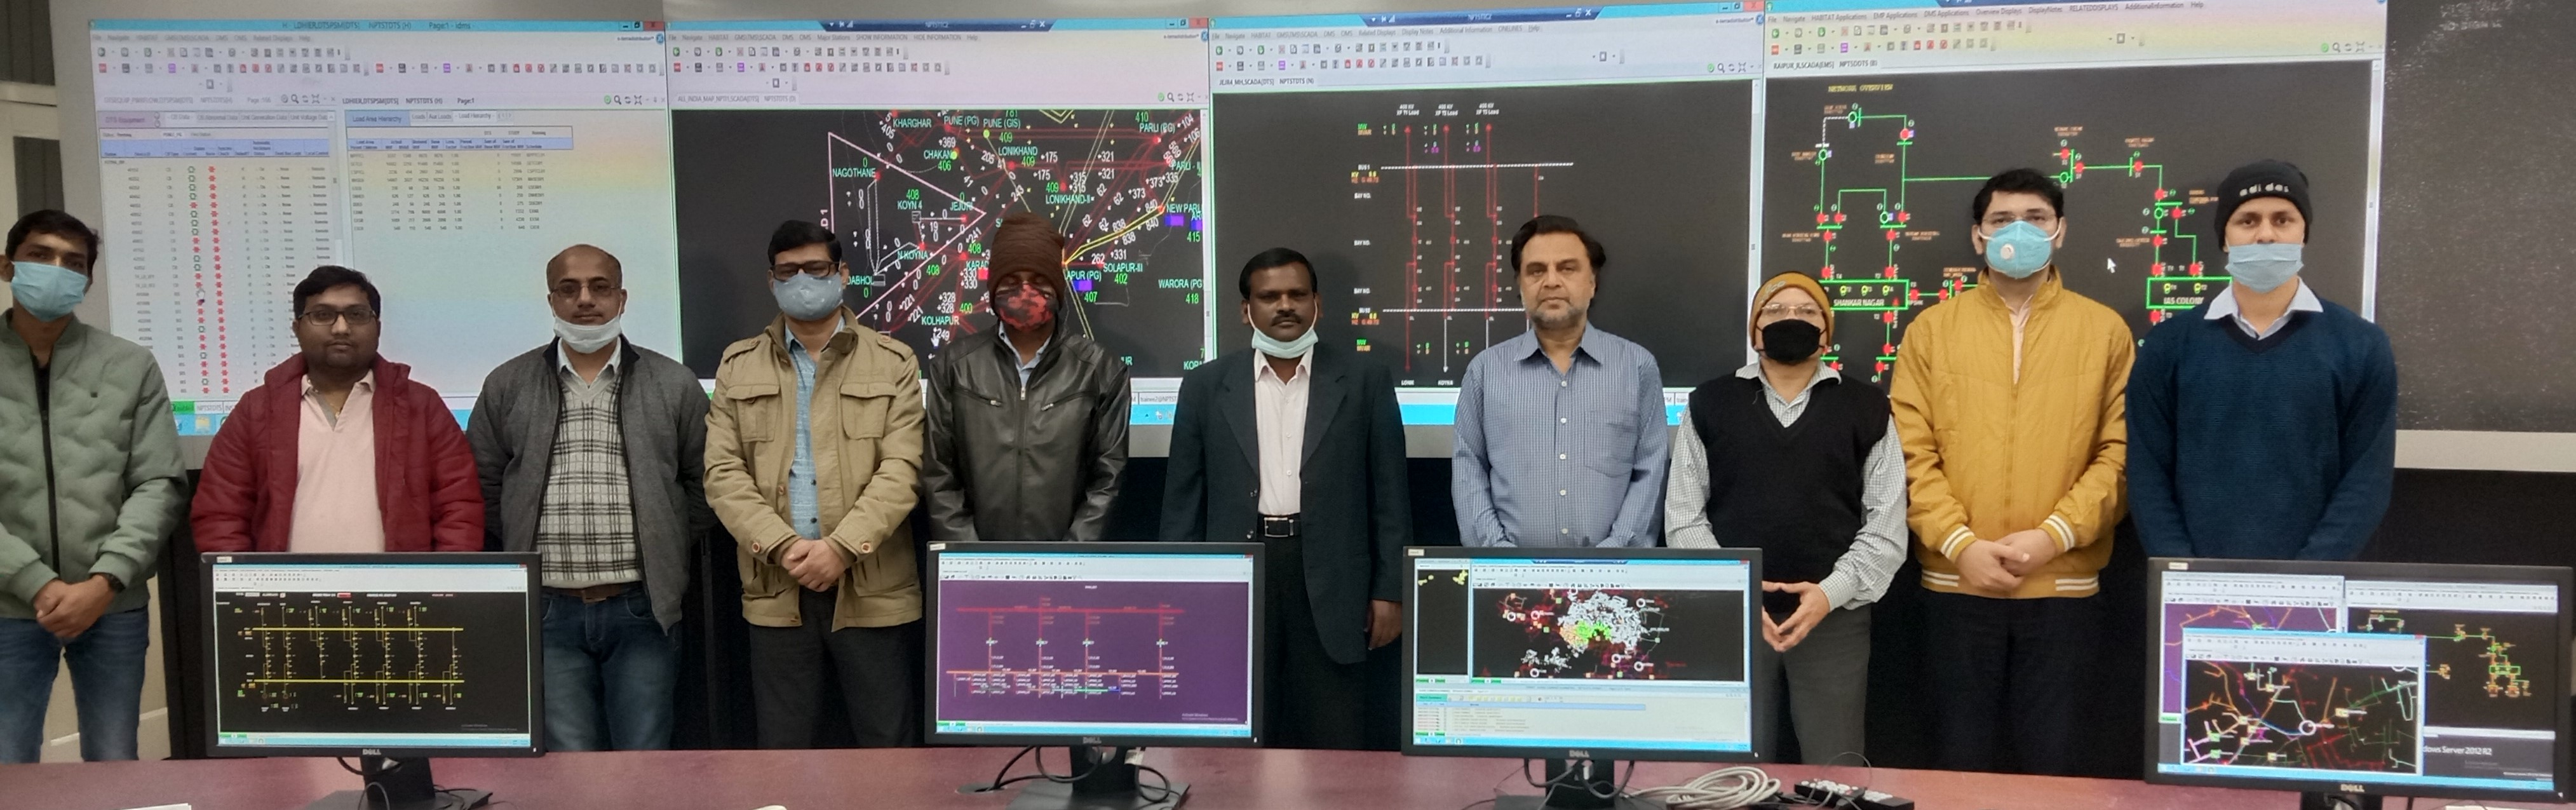 http://npti.gov.in/npti_shivpuri/sites/npti-shivpuri.com/files/banner_image/21.jpg